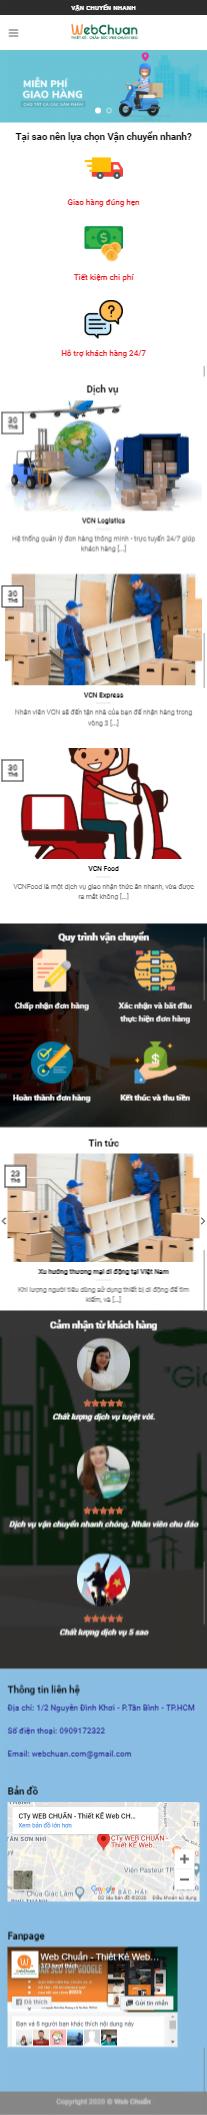 screencapture-gioithieufs10-webchuan-2020-06-30-15_49_50